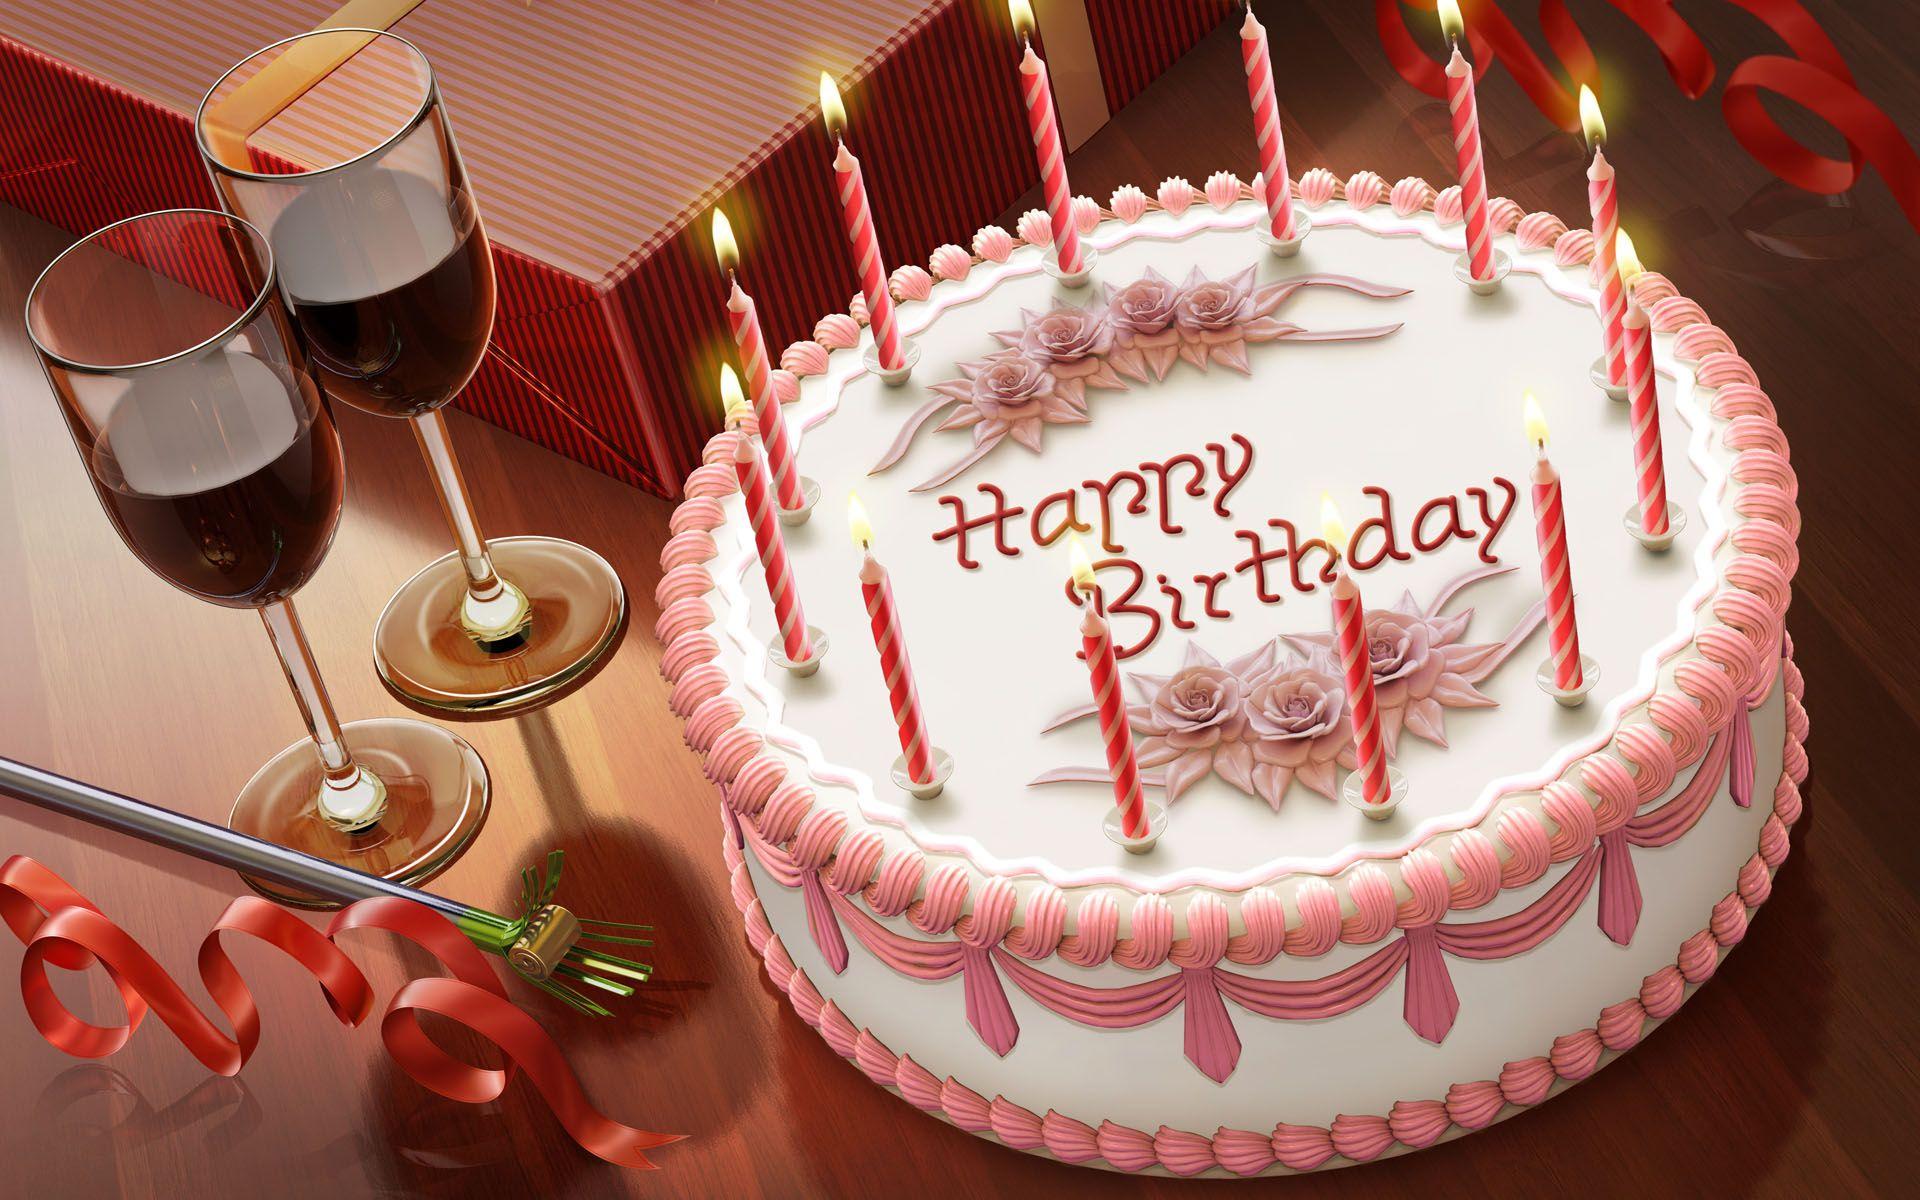 y Happy Birthday Wishes HAPPY BIRTHDAY Irene